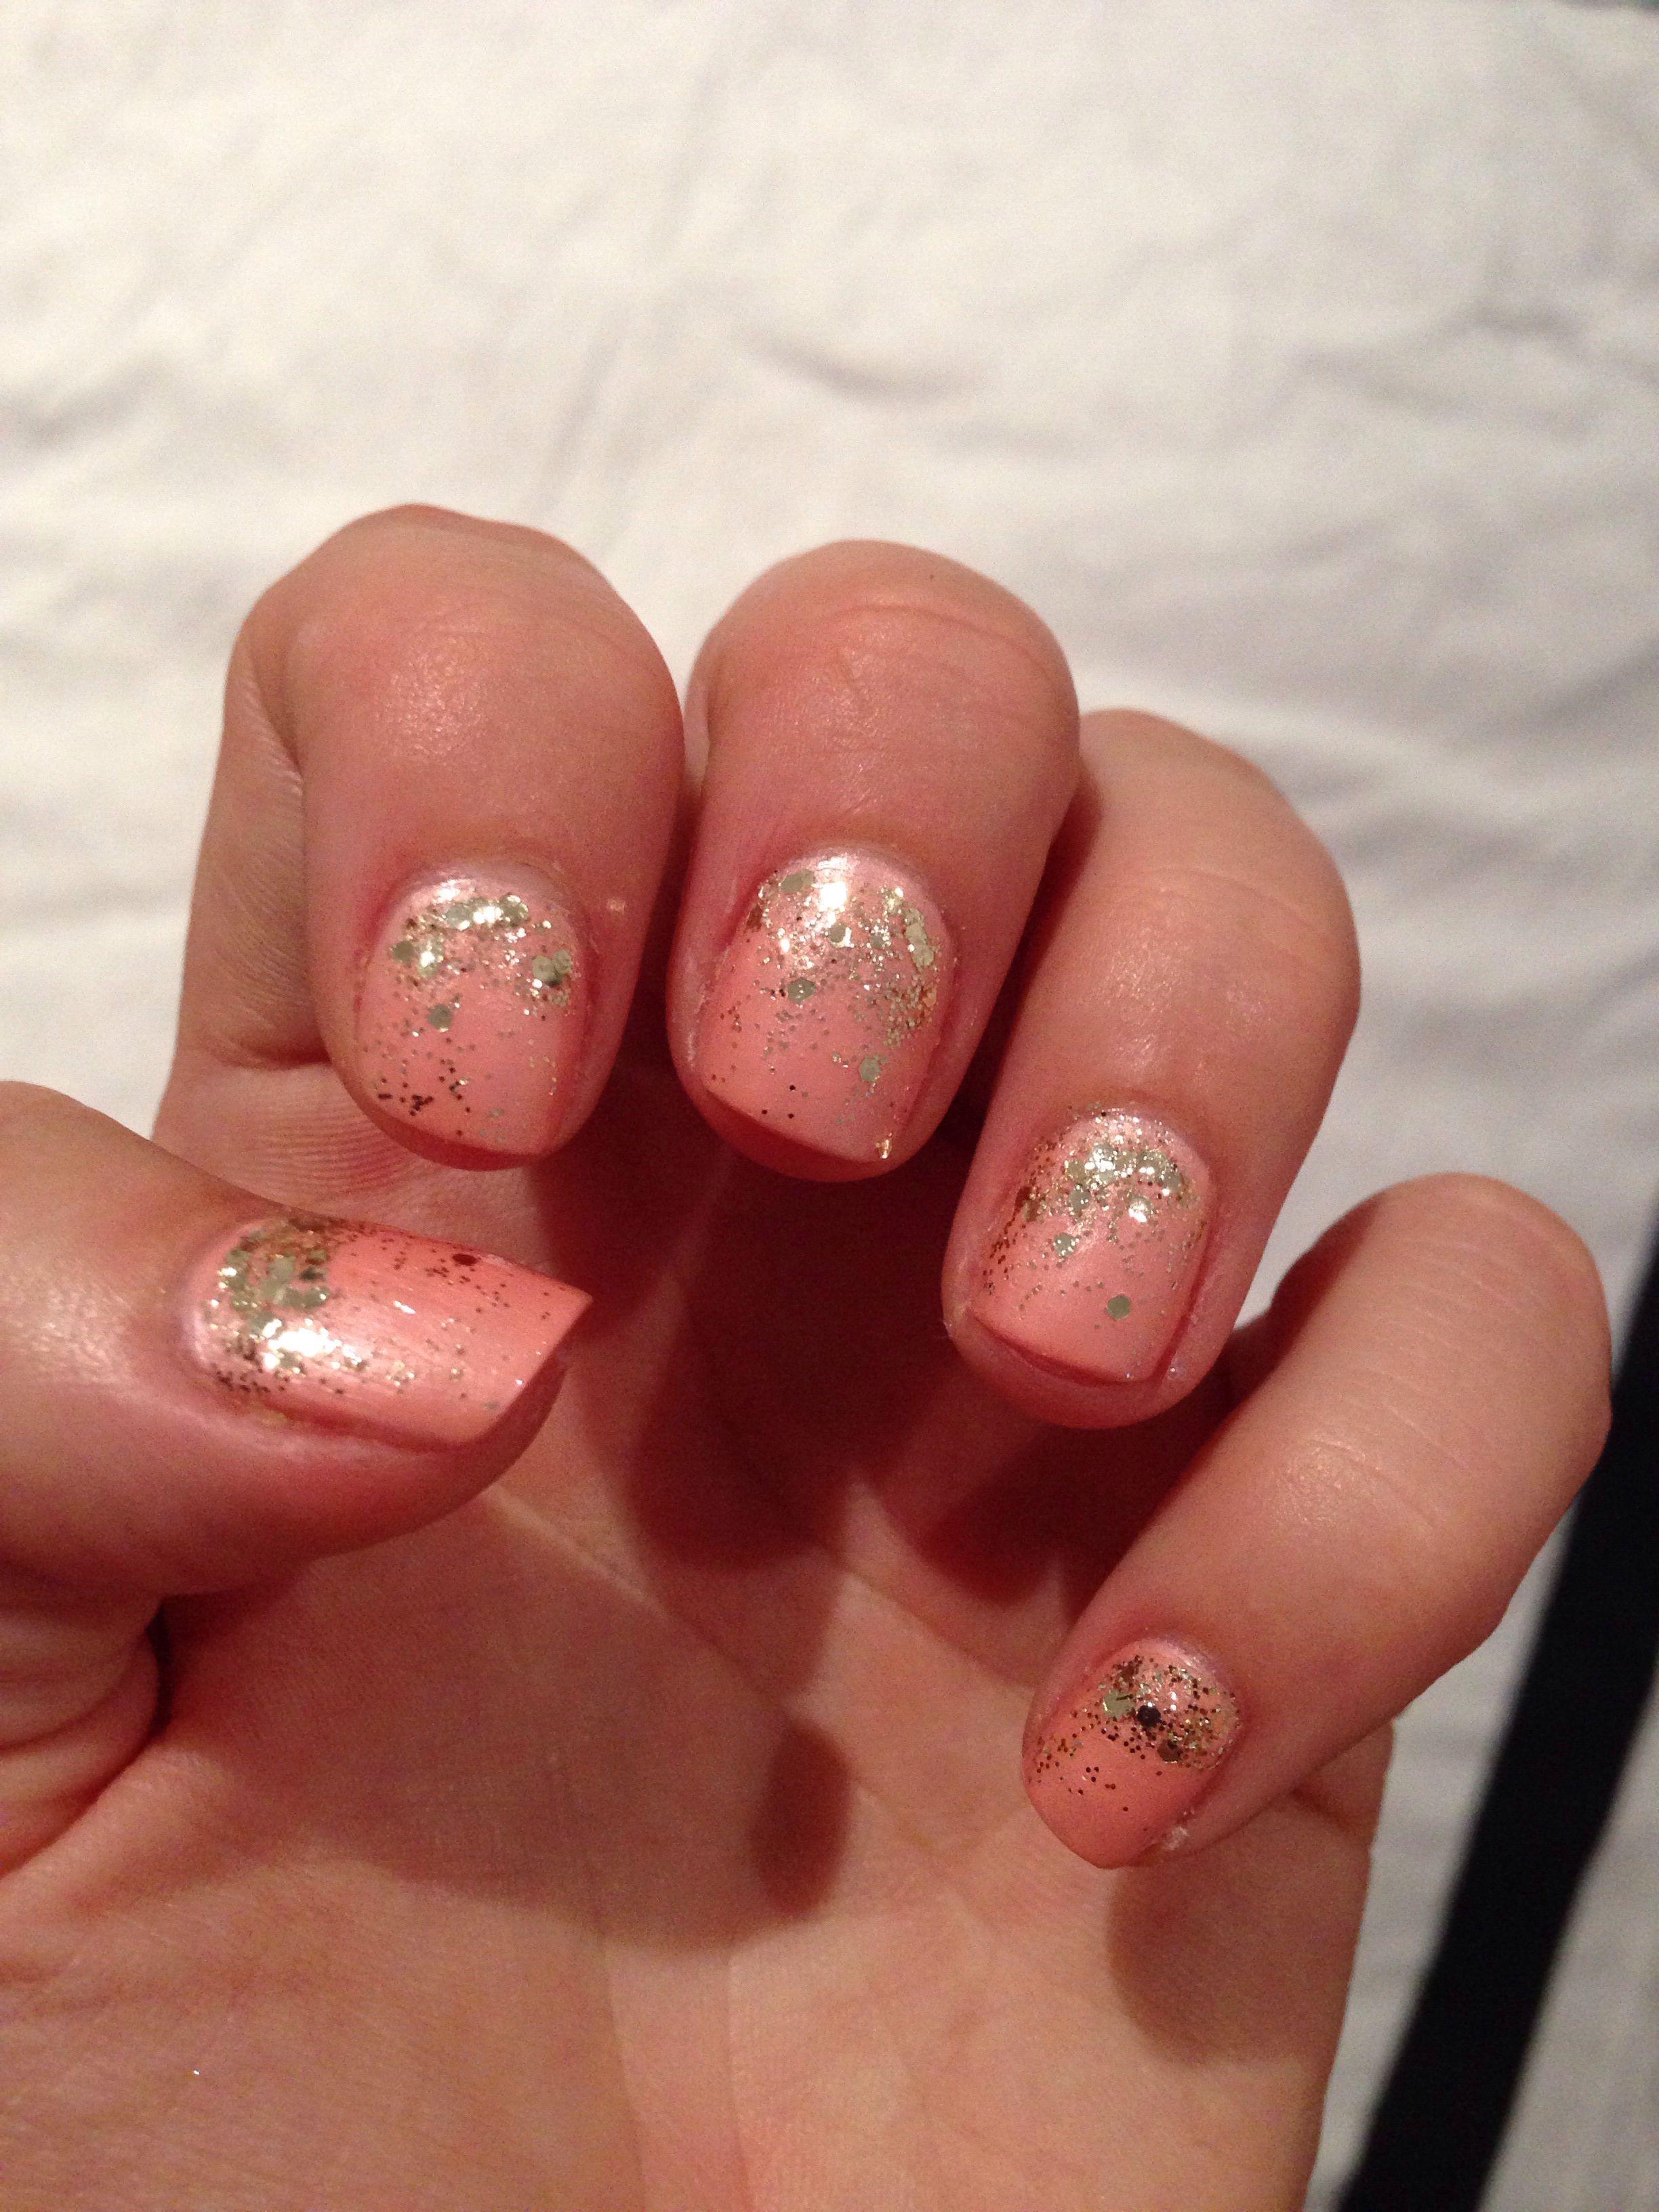 Summer nails nails pinterest summer nails nails